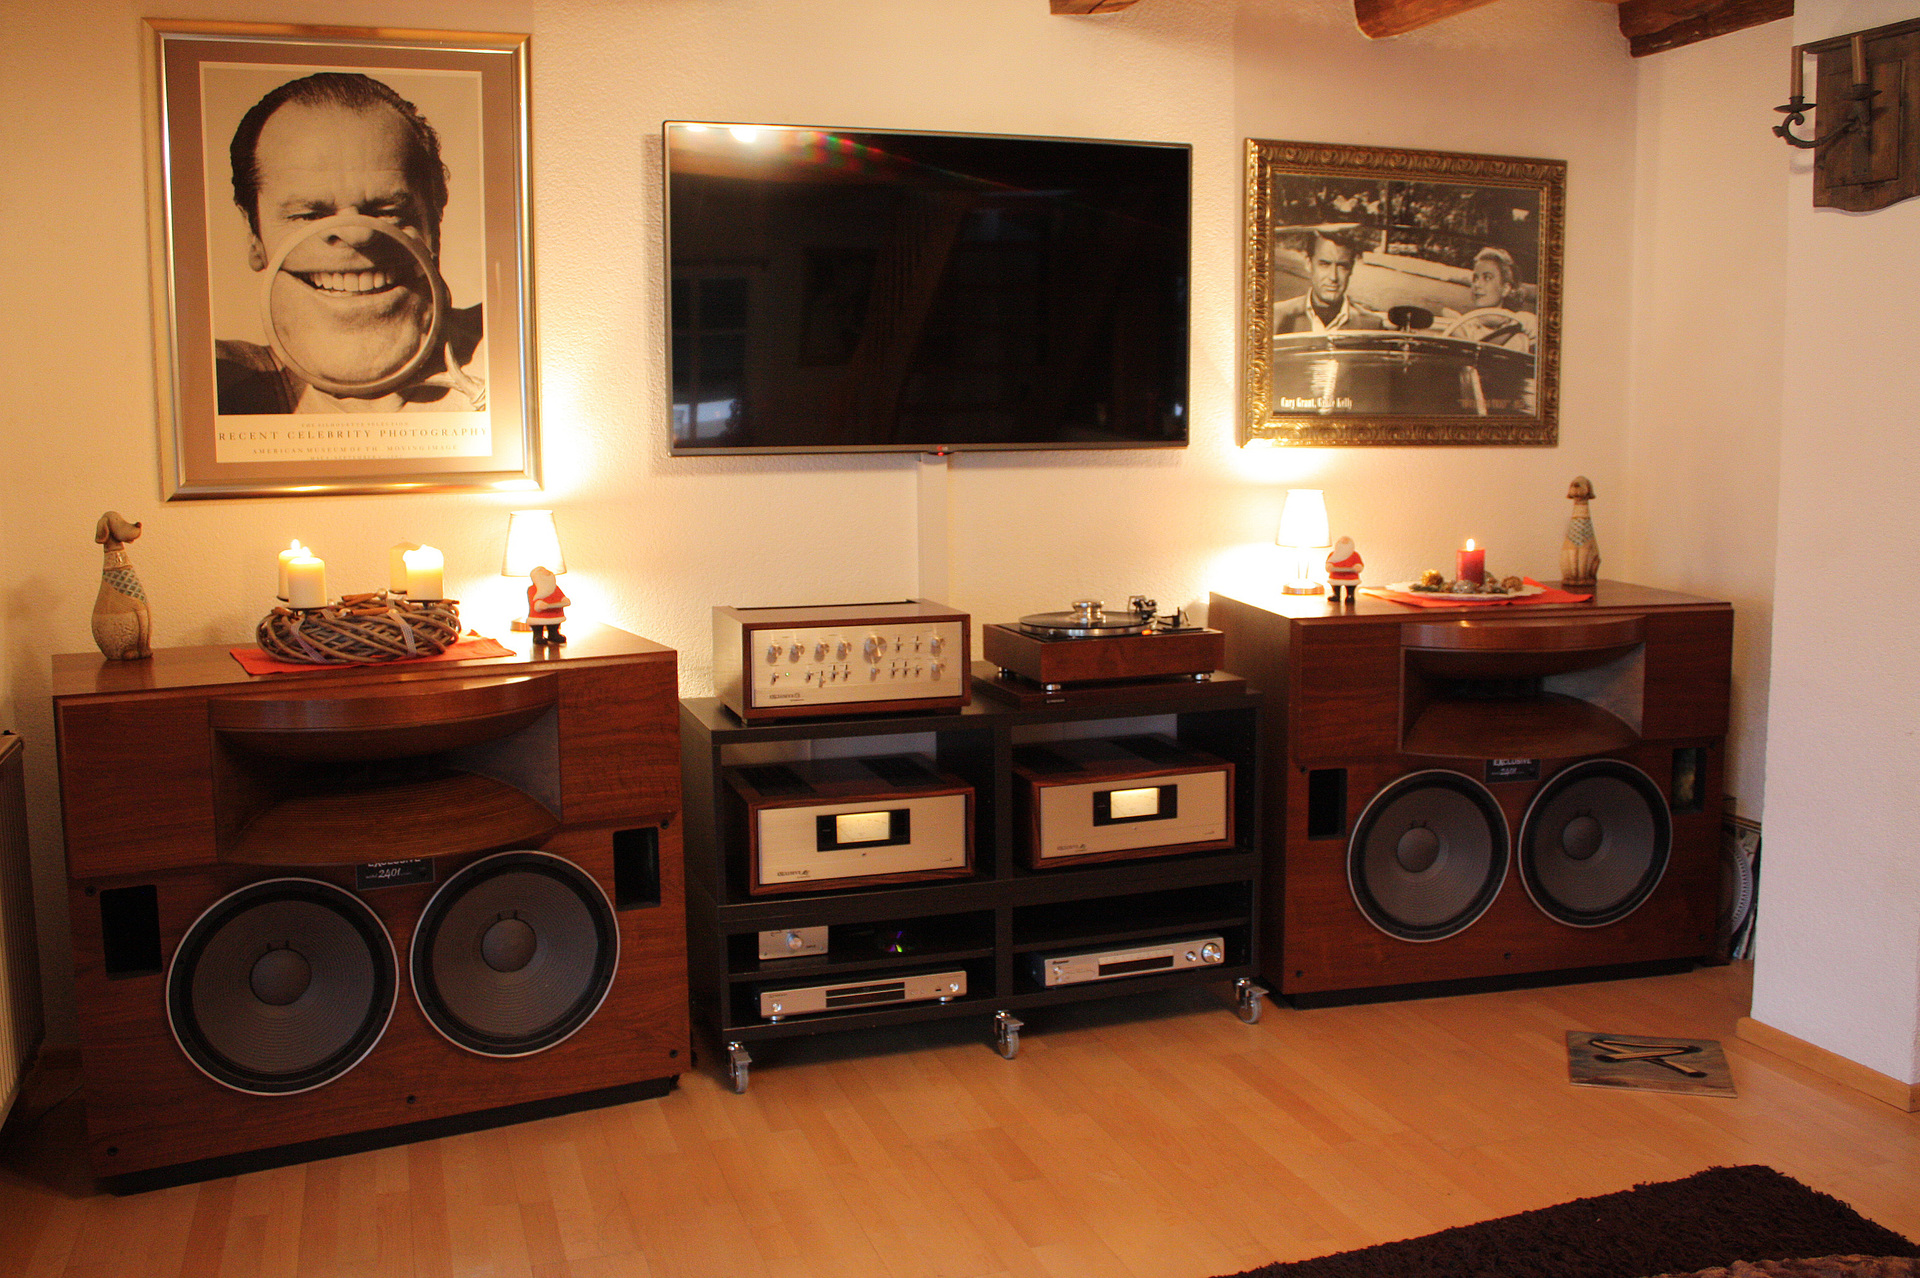 pioneer exclusive stereo hifi anlage exclusive pioneer stereohifianlage hifi. Black Bedroom Furniture Sets. Home Design Ideas